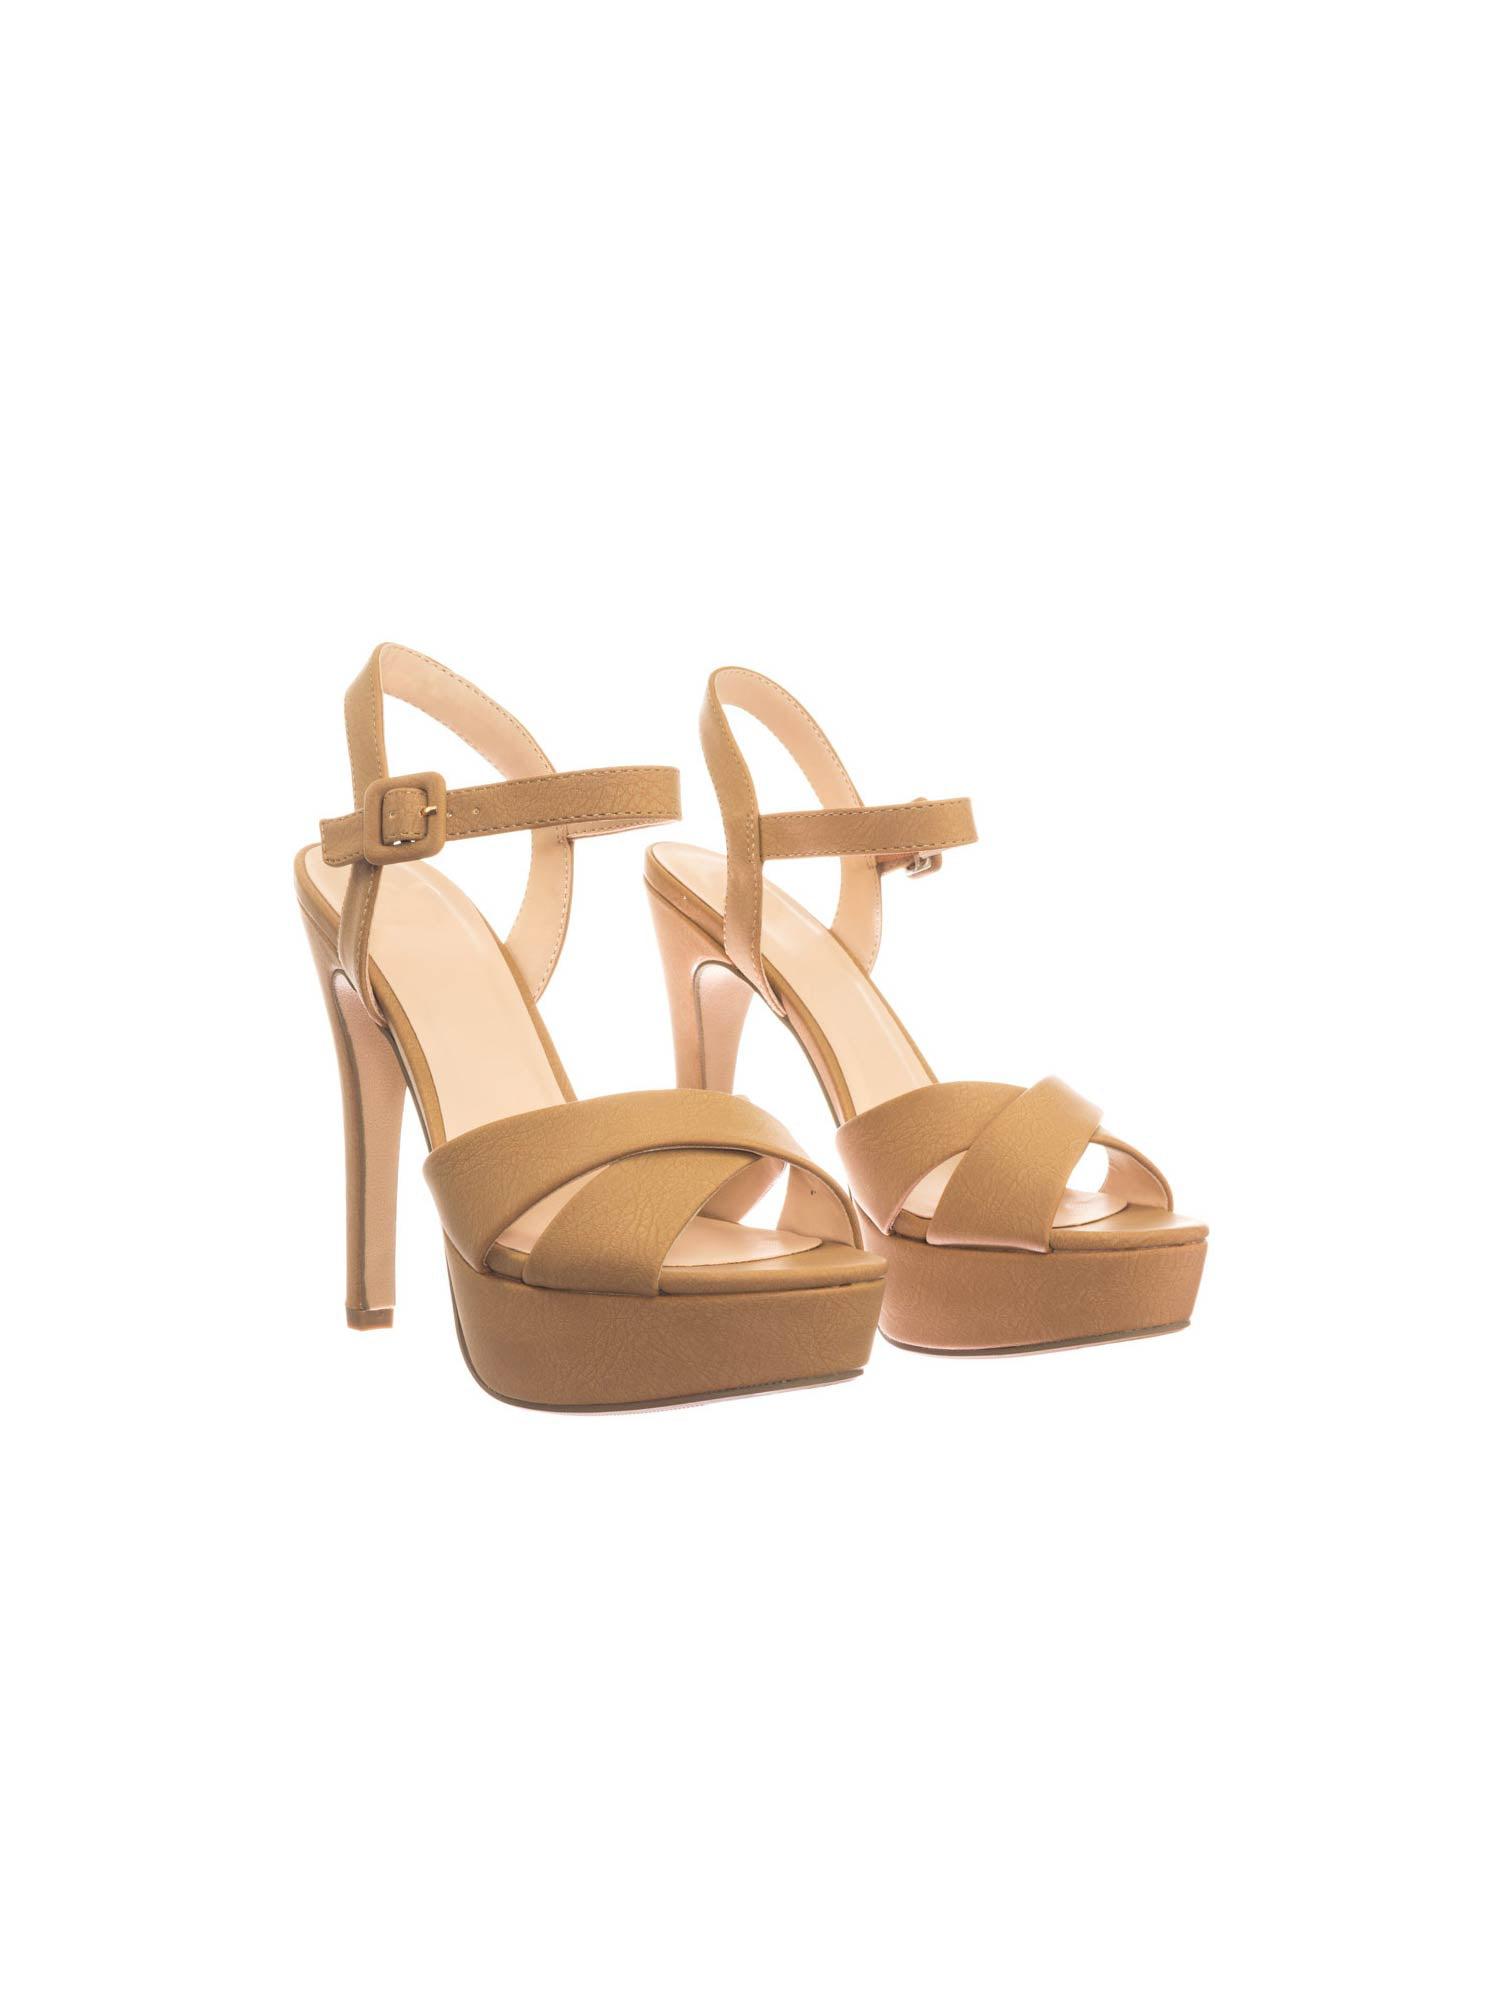 Eyewear by Delicious, High Heel Platform Sandal Open Toe Criss Cross Sandal Platform In Solid & Floral Print 2f1f07